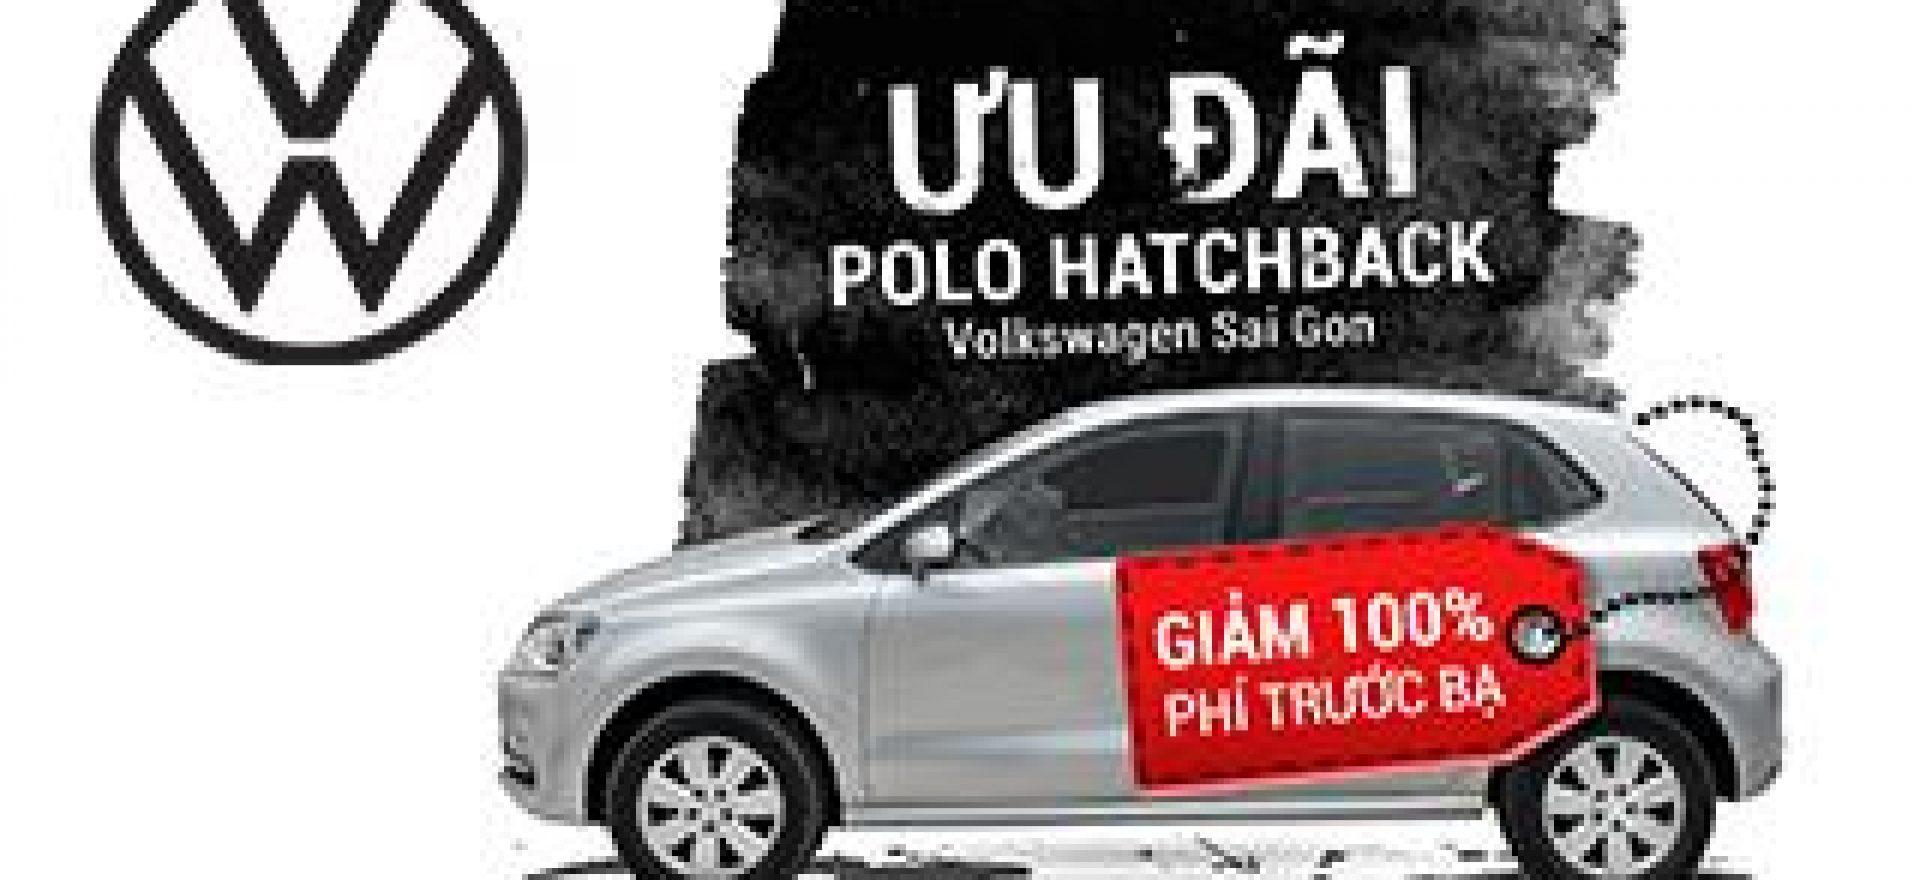 w-saigon-giam-100%-phi-truoc-ba-polo-hatchback-2018-avatar